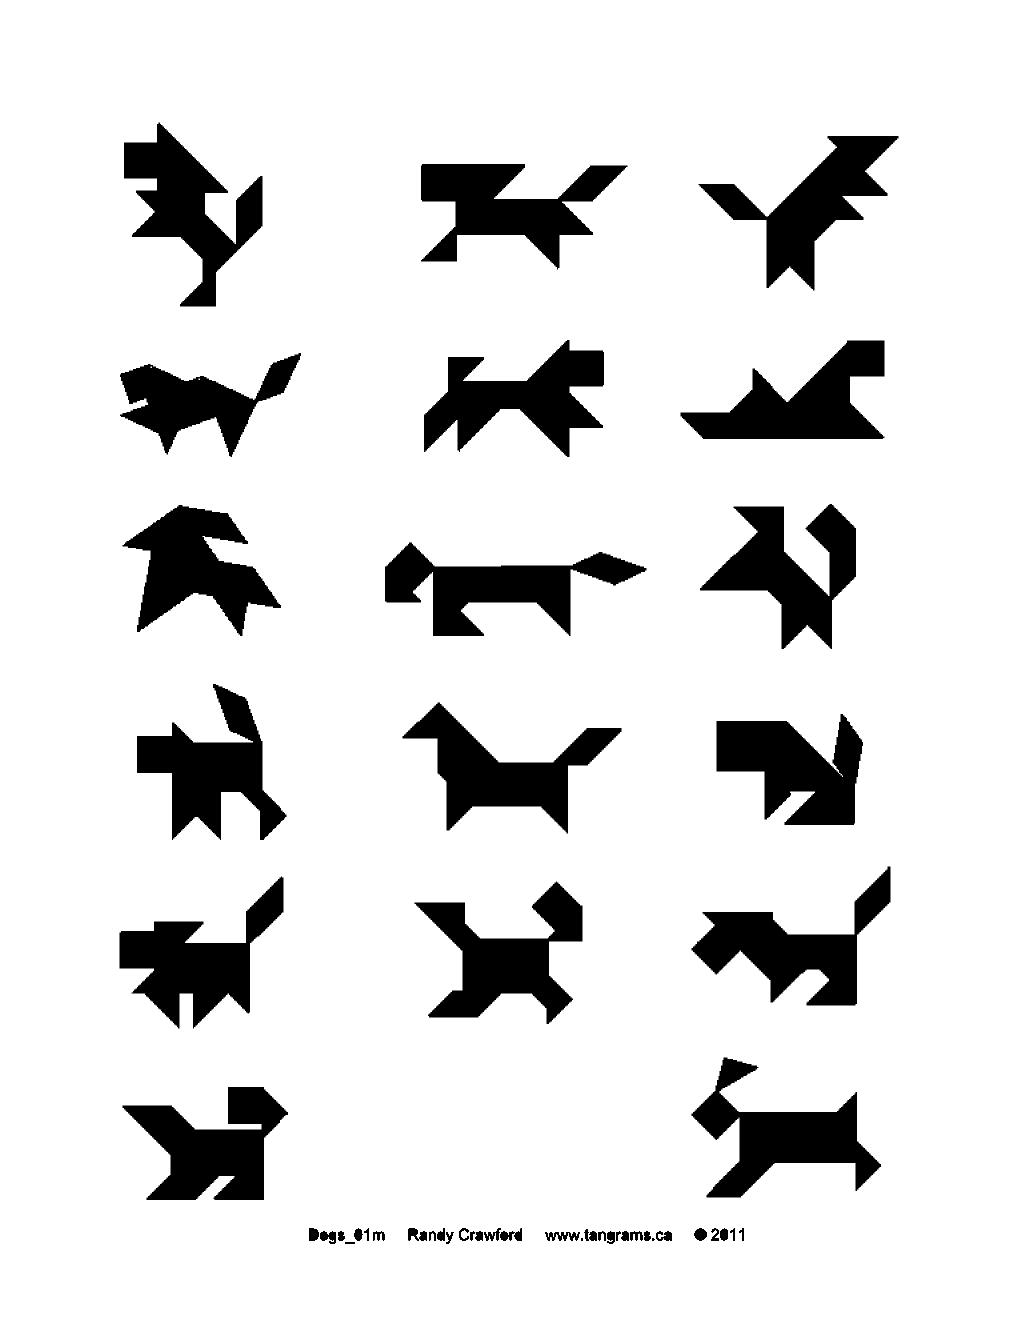 Tangram Dogs | Tangrams.ca - History - Make - Puzzles concernant Tangram Modèles Et Solutions